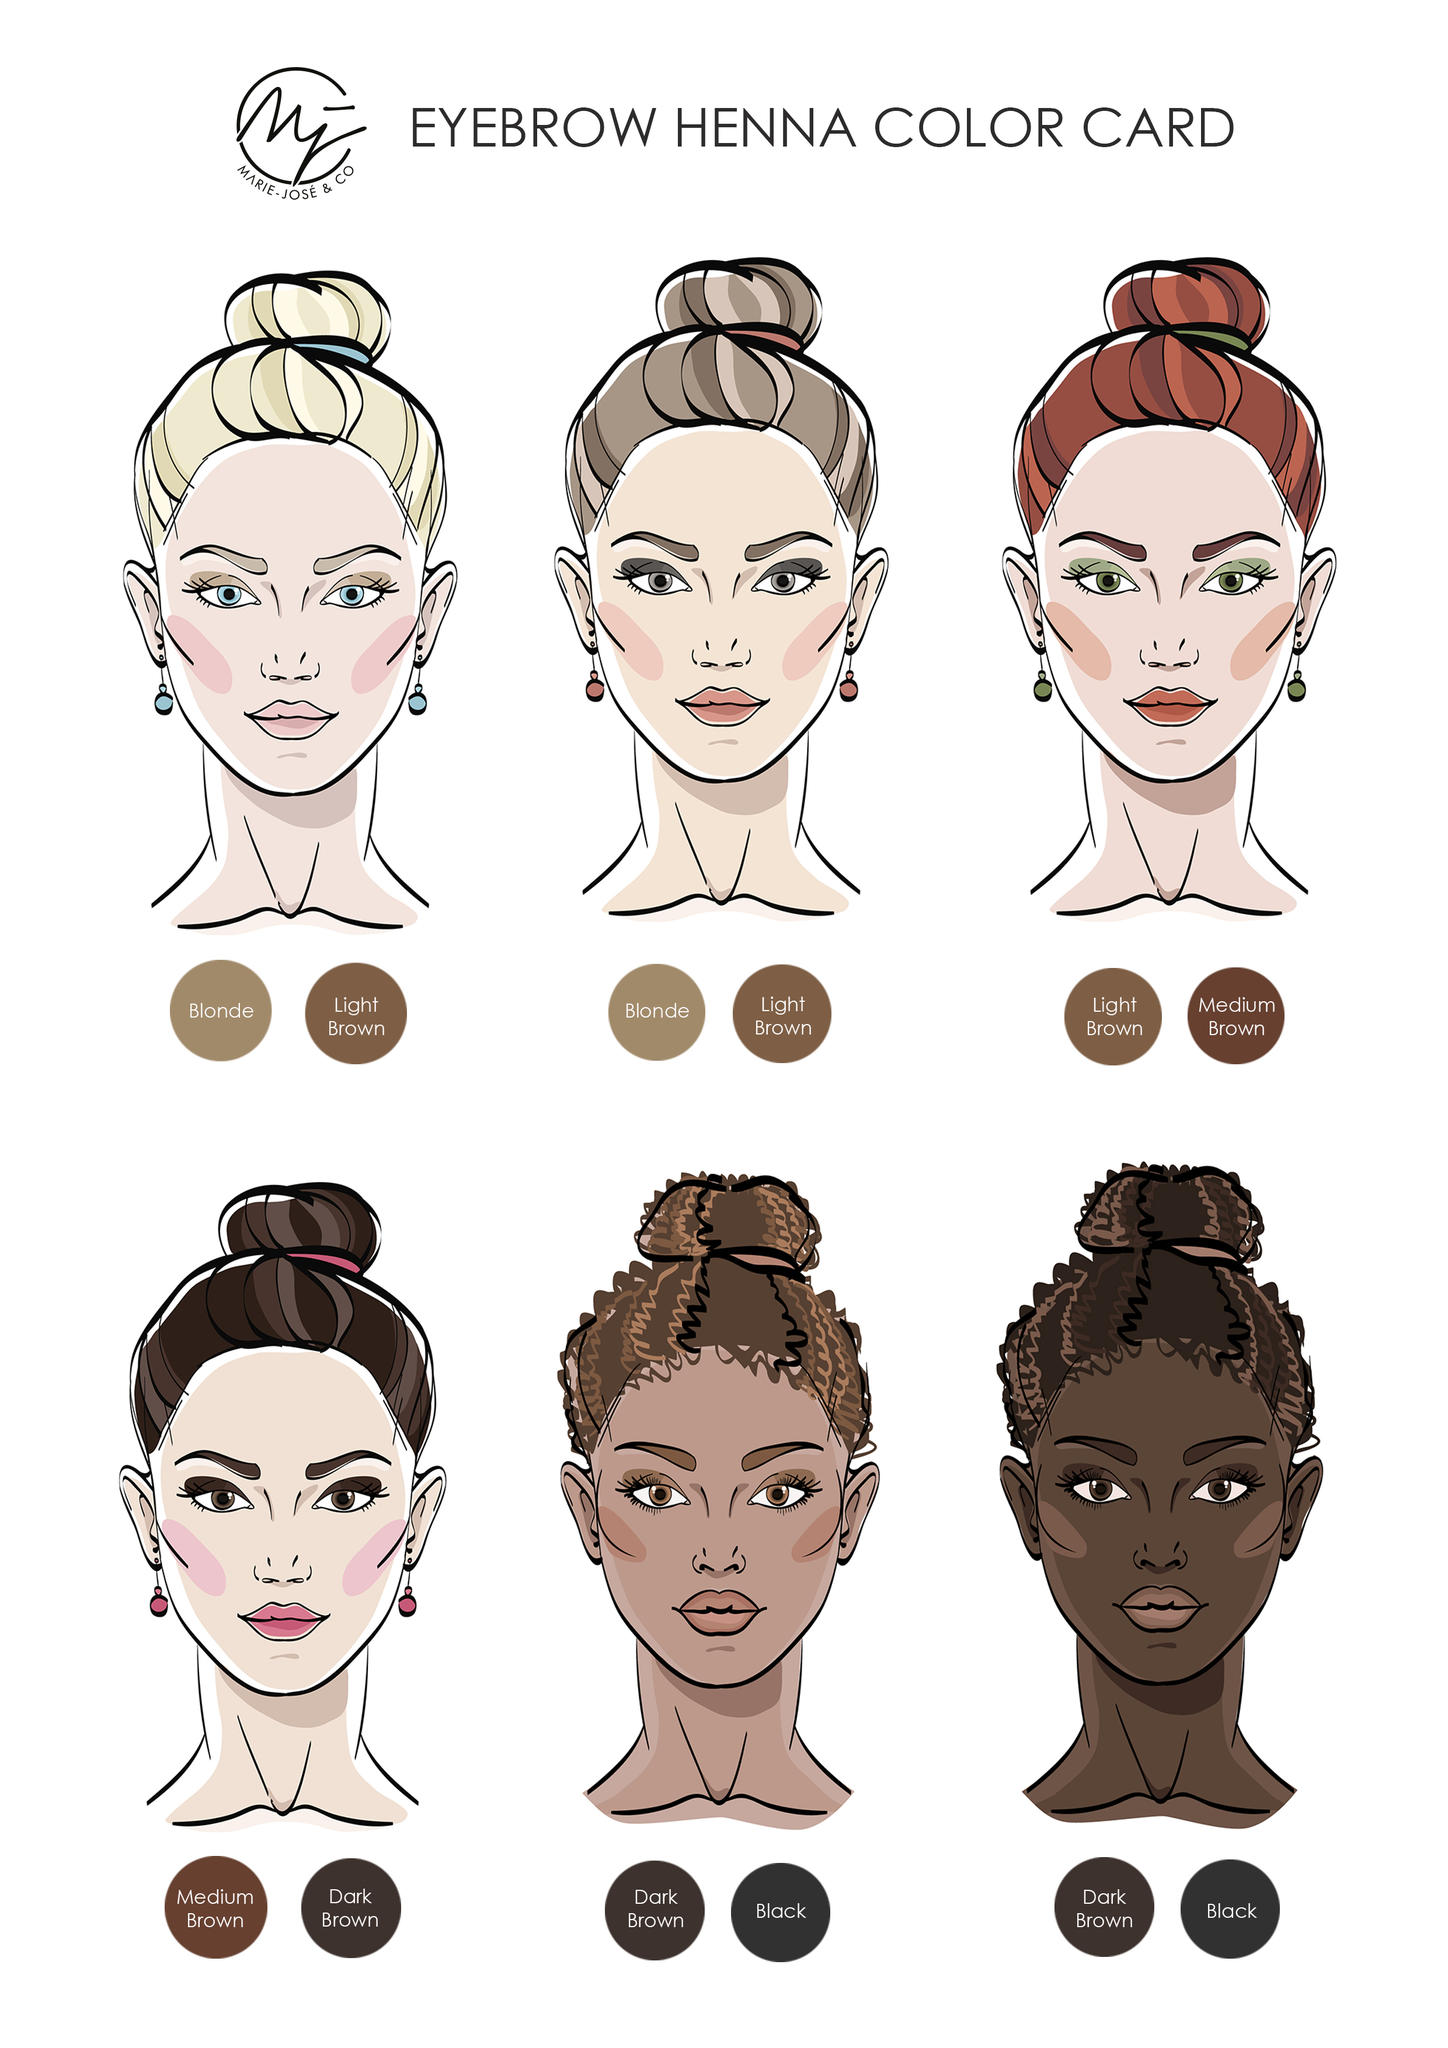 Eyebrow Henna: Dye Your Brows With Eyebrow Henna